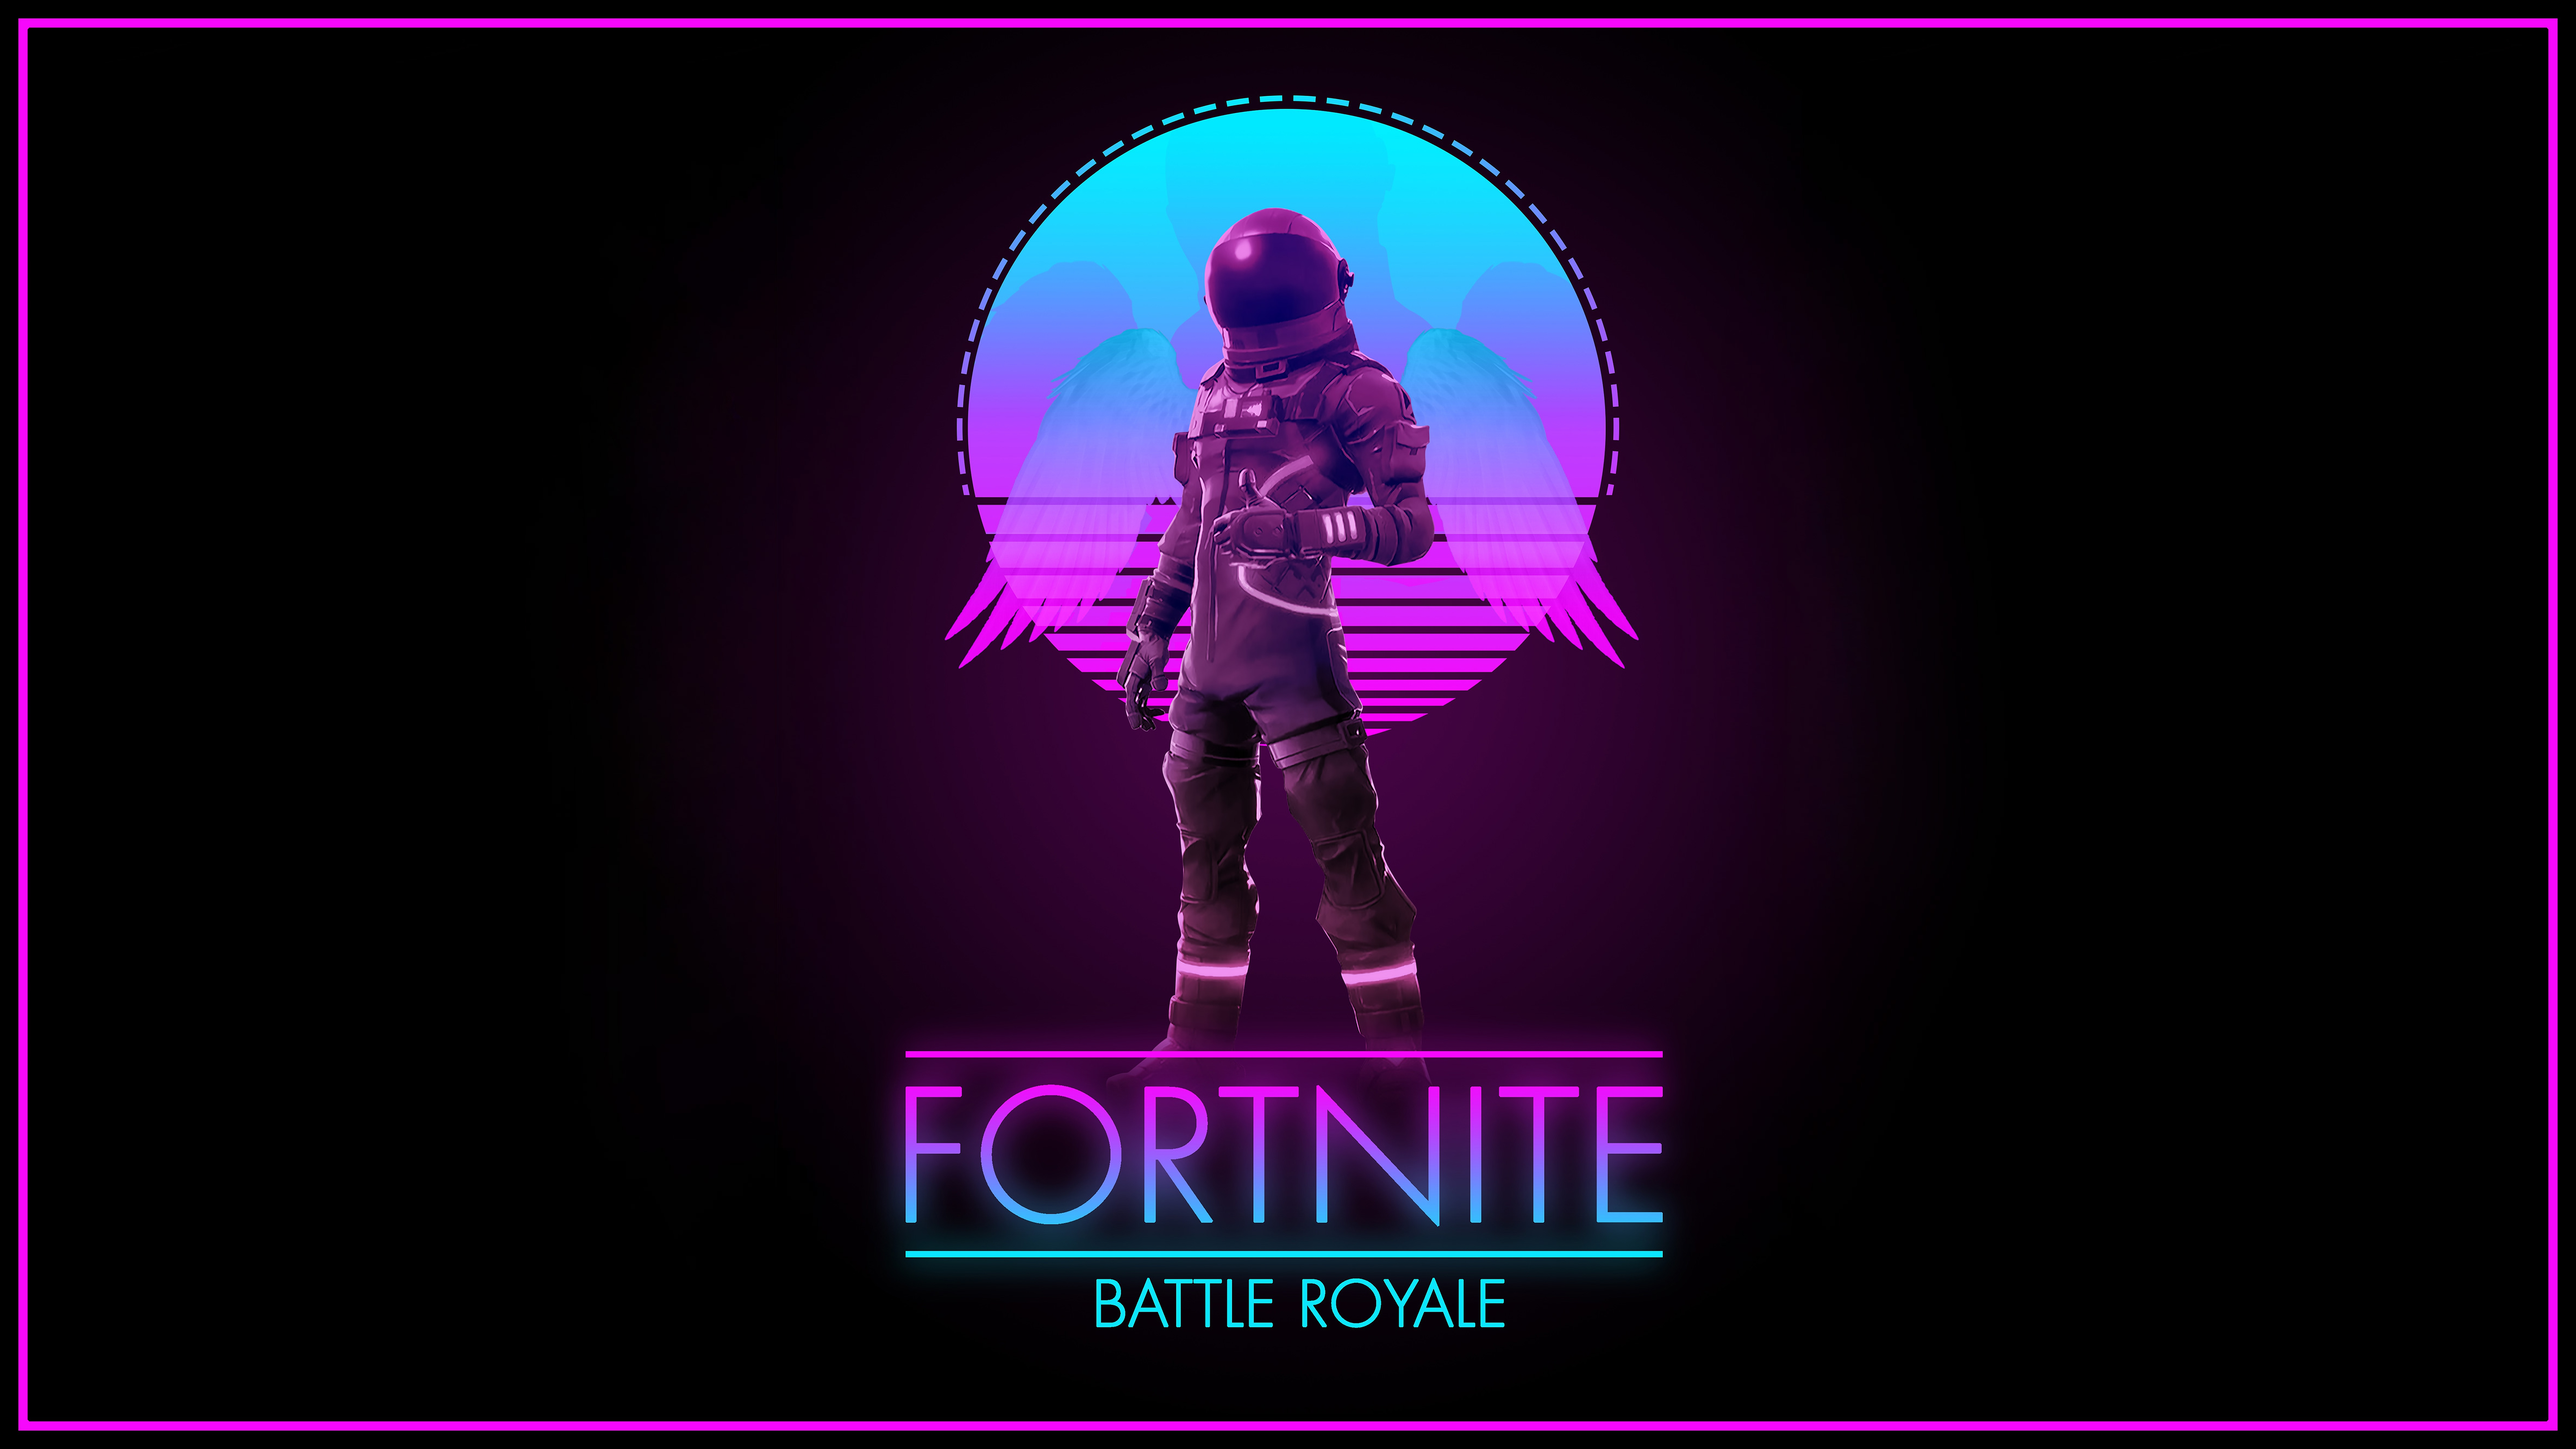 Fortnite background 11